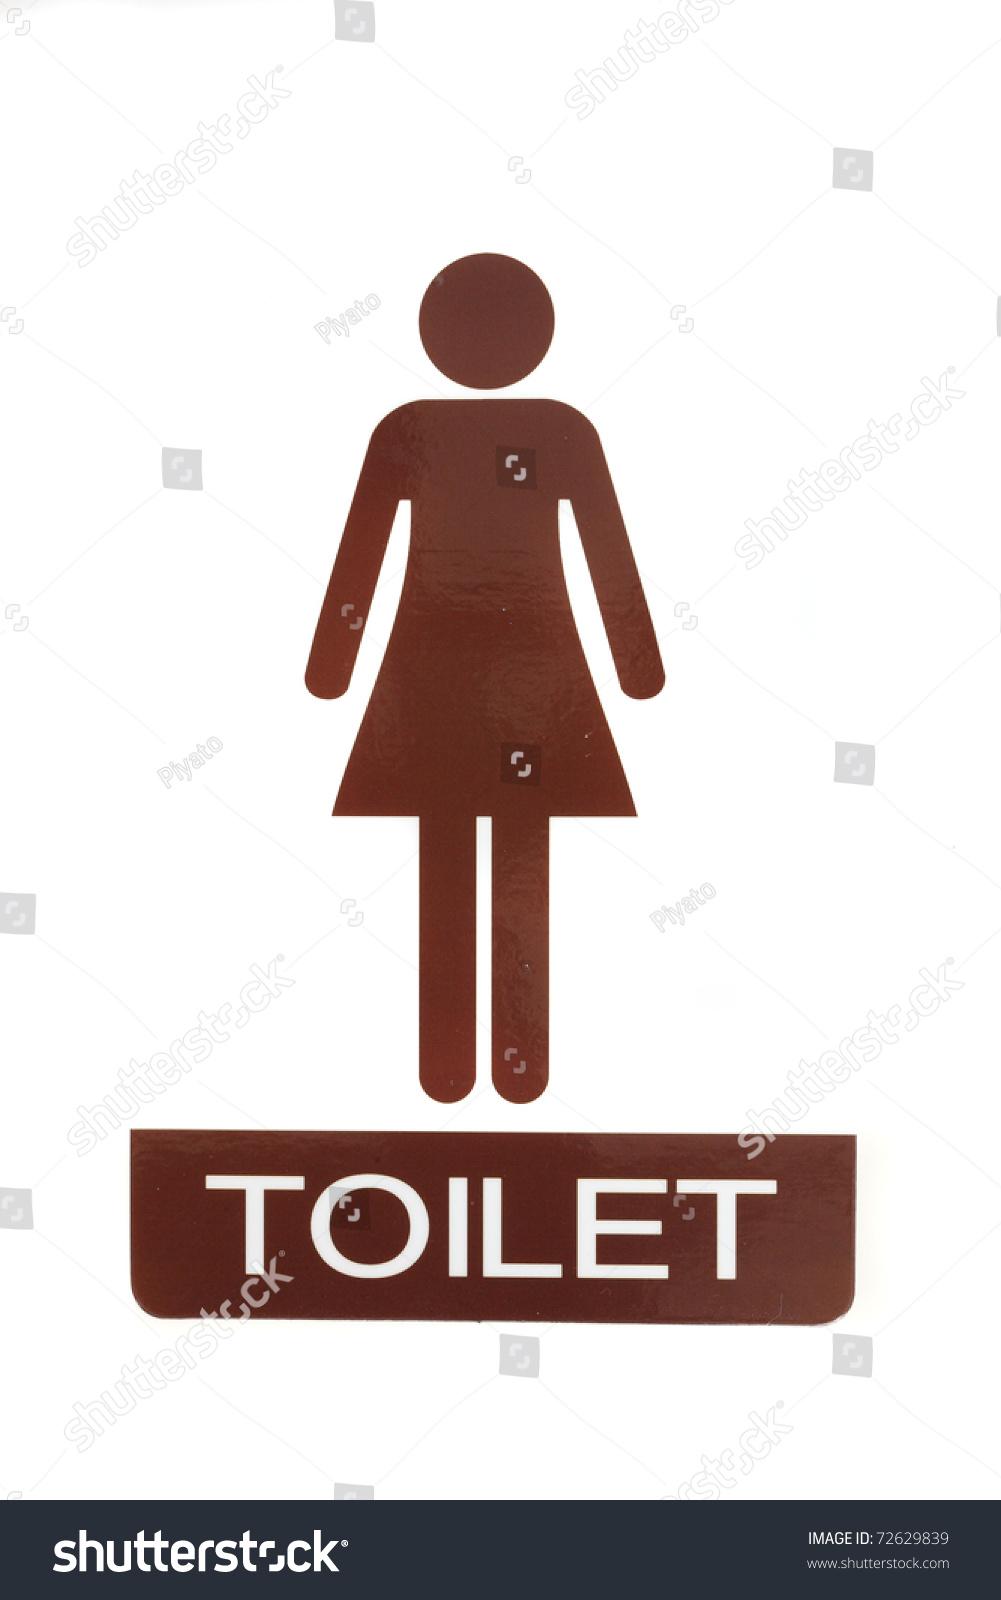 Female Toilet Symbols Stock Photo 72629839 Shutterstock